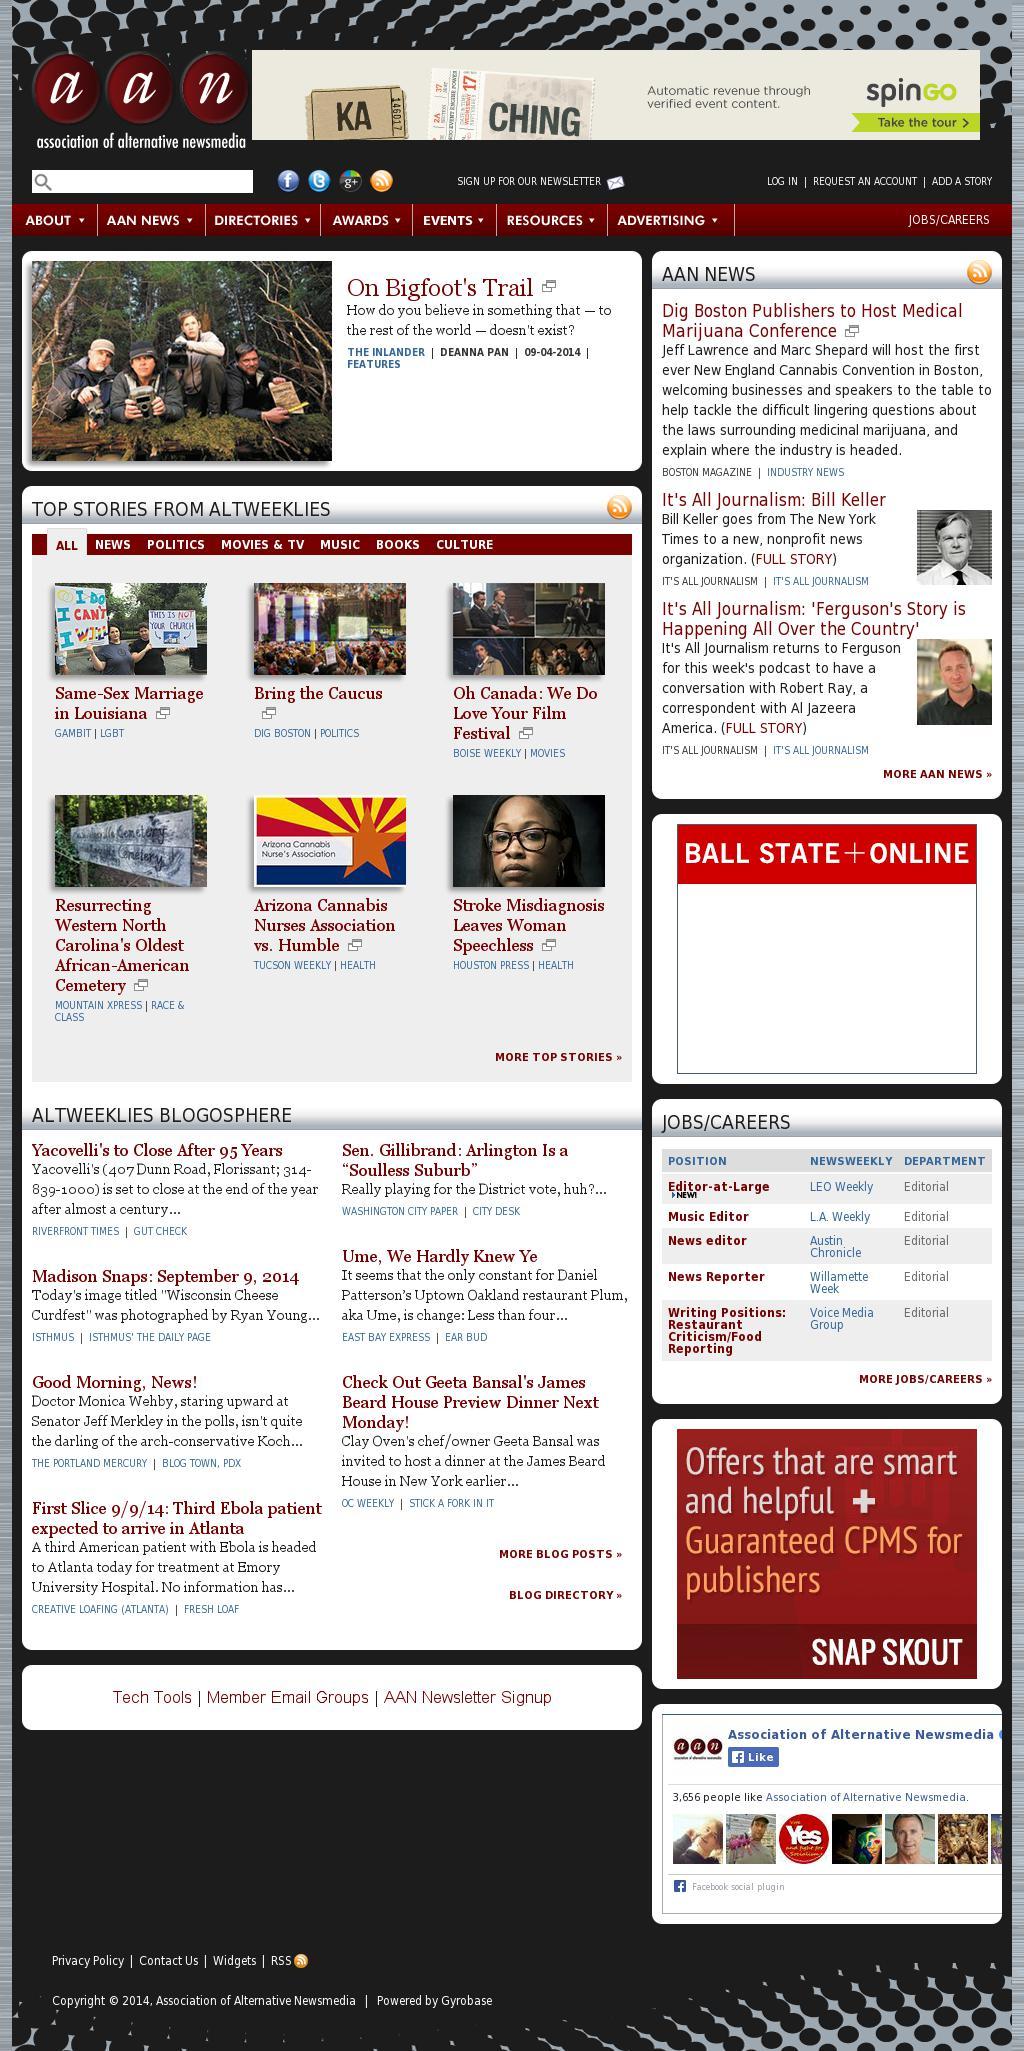 Association of Alternative Newsmedia at Tuesday Sept. 9, 2014, 6 p.m. UTC